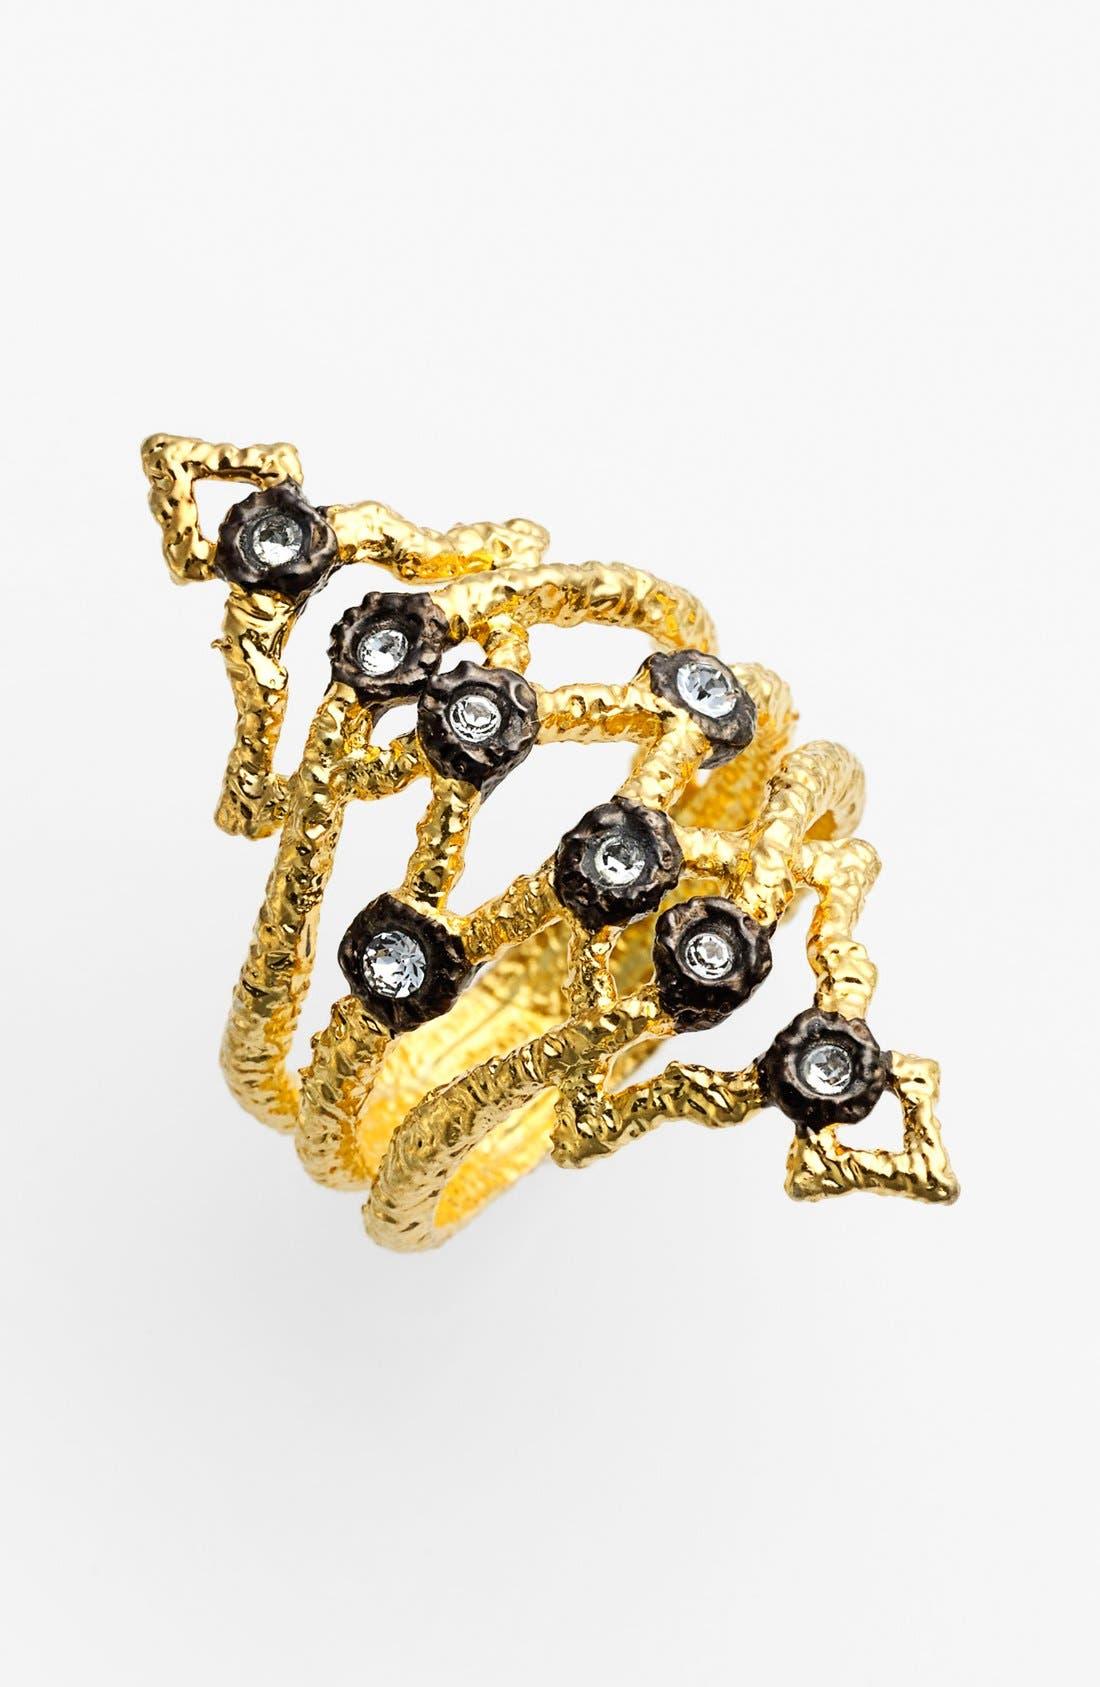 Main Image - Alexis Bittar 'Elements - Jardin de Papillon' Open Ring